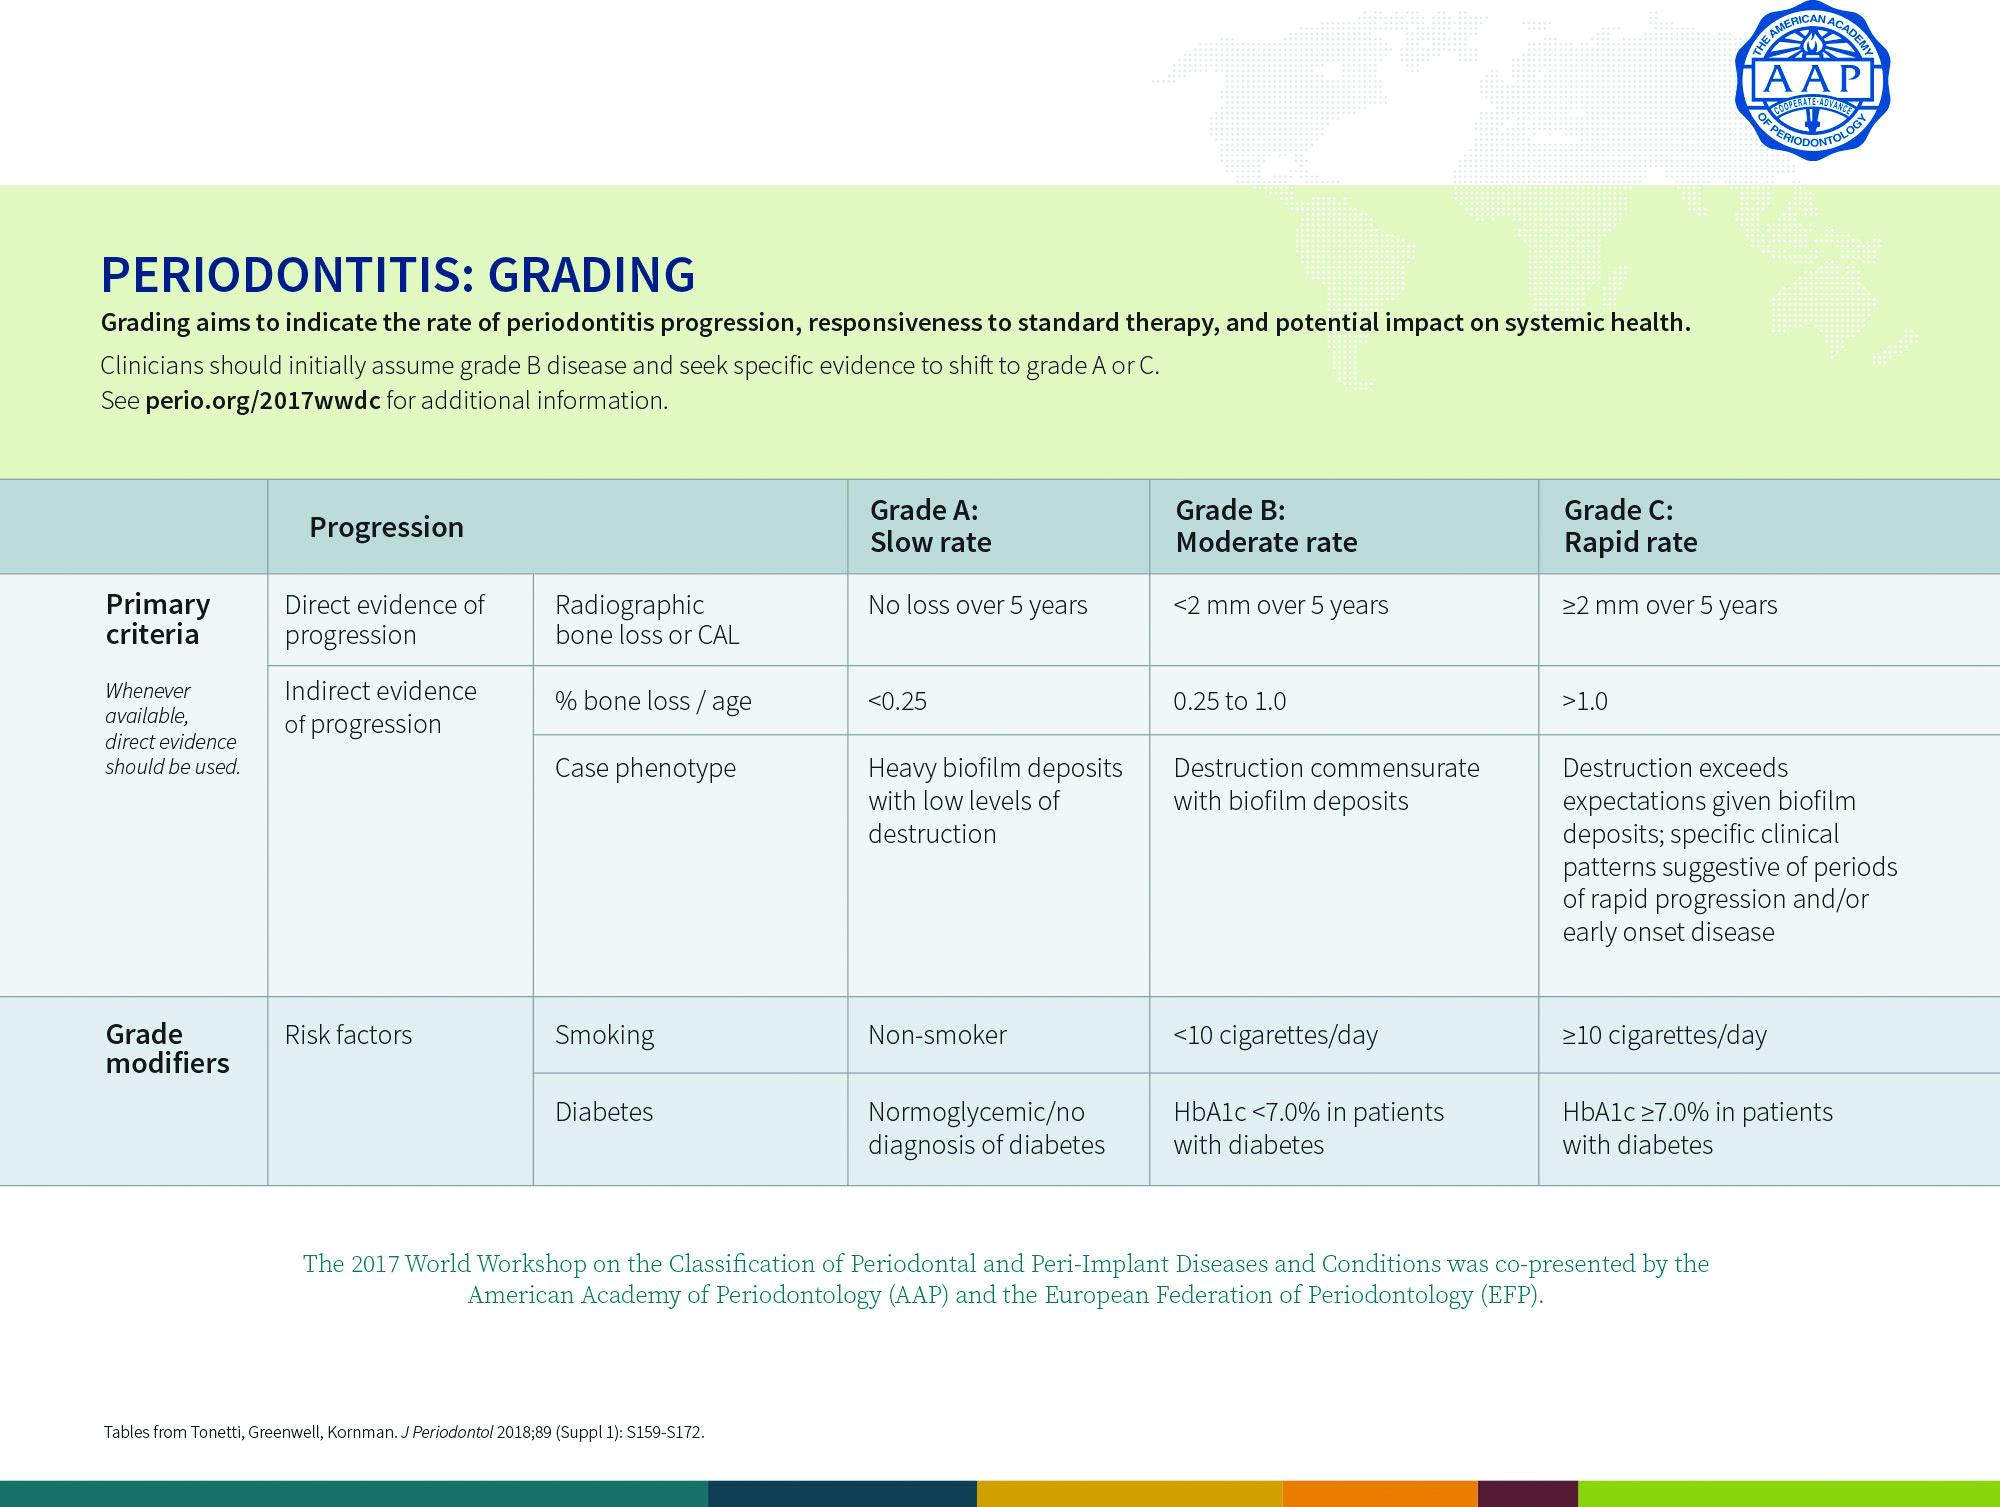 Periodontitis Grading